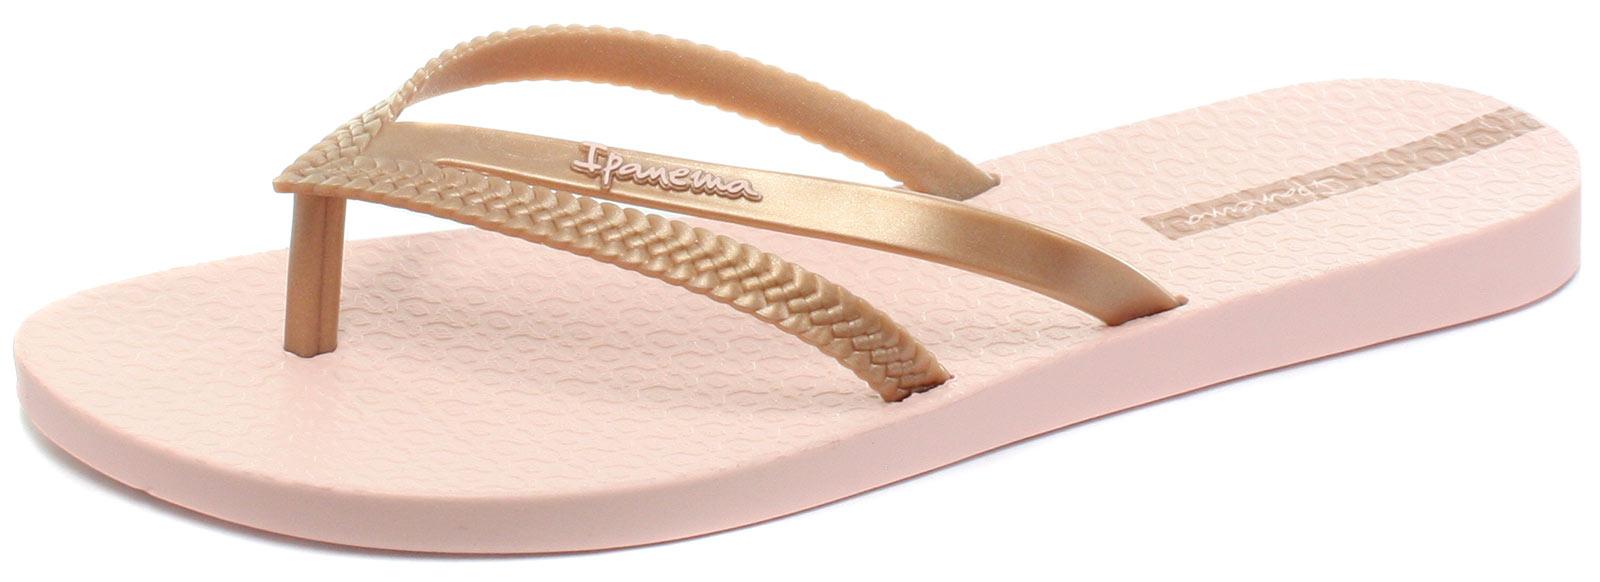 214d13c64 Ipanema Women s Bossa Flip Flops Anatomic Footbed Versatile Style ...